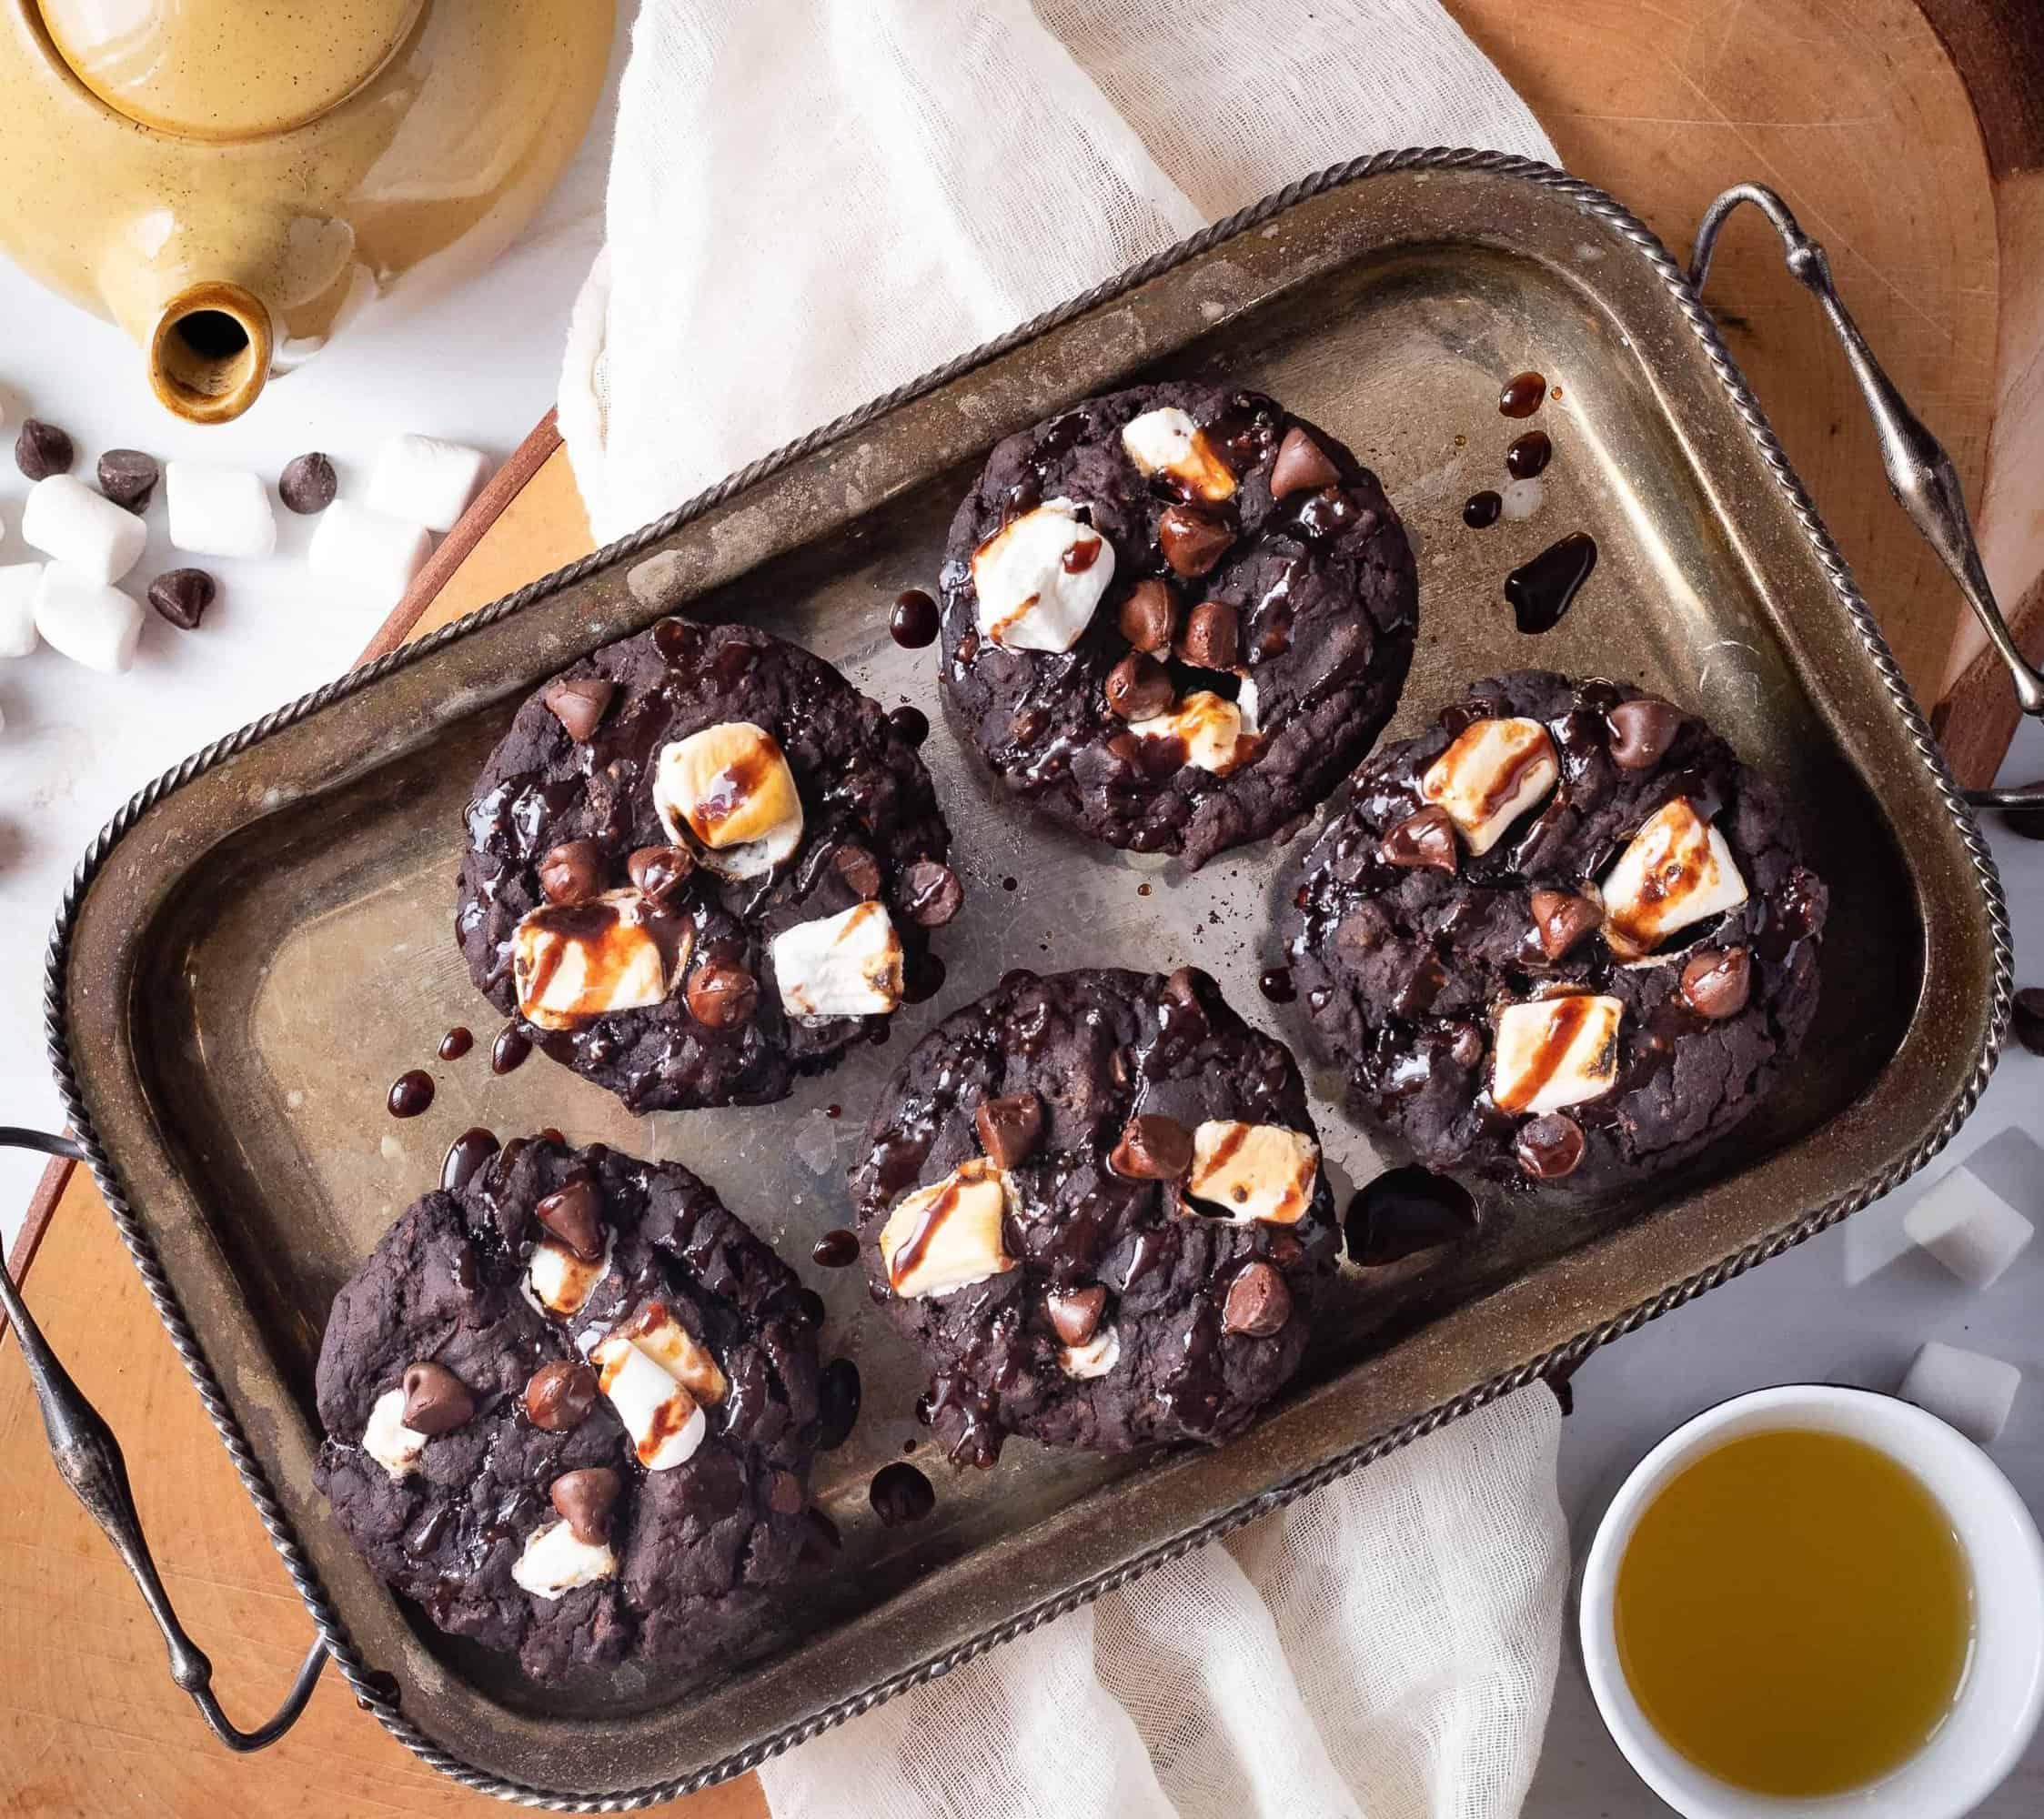 smore-muffins-2-of-5-e1553890288384.jpg